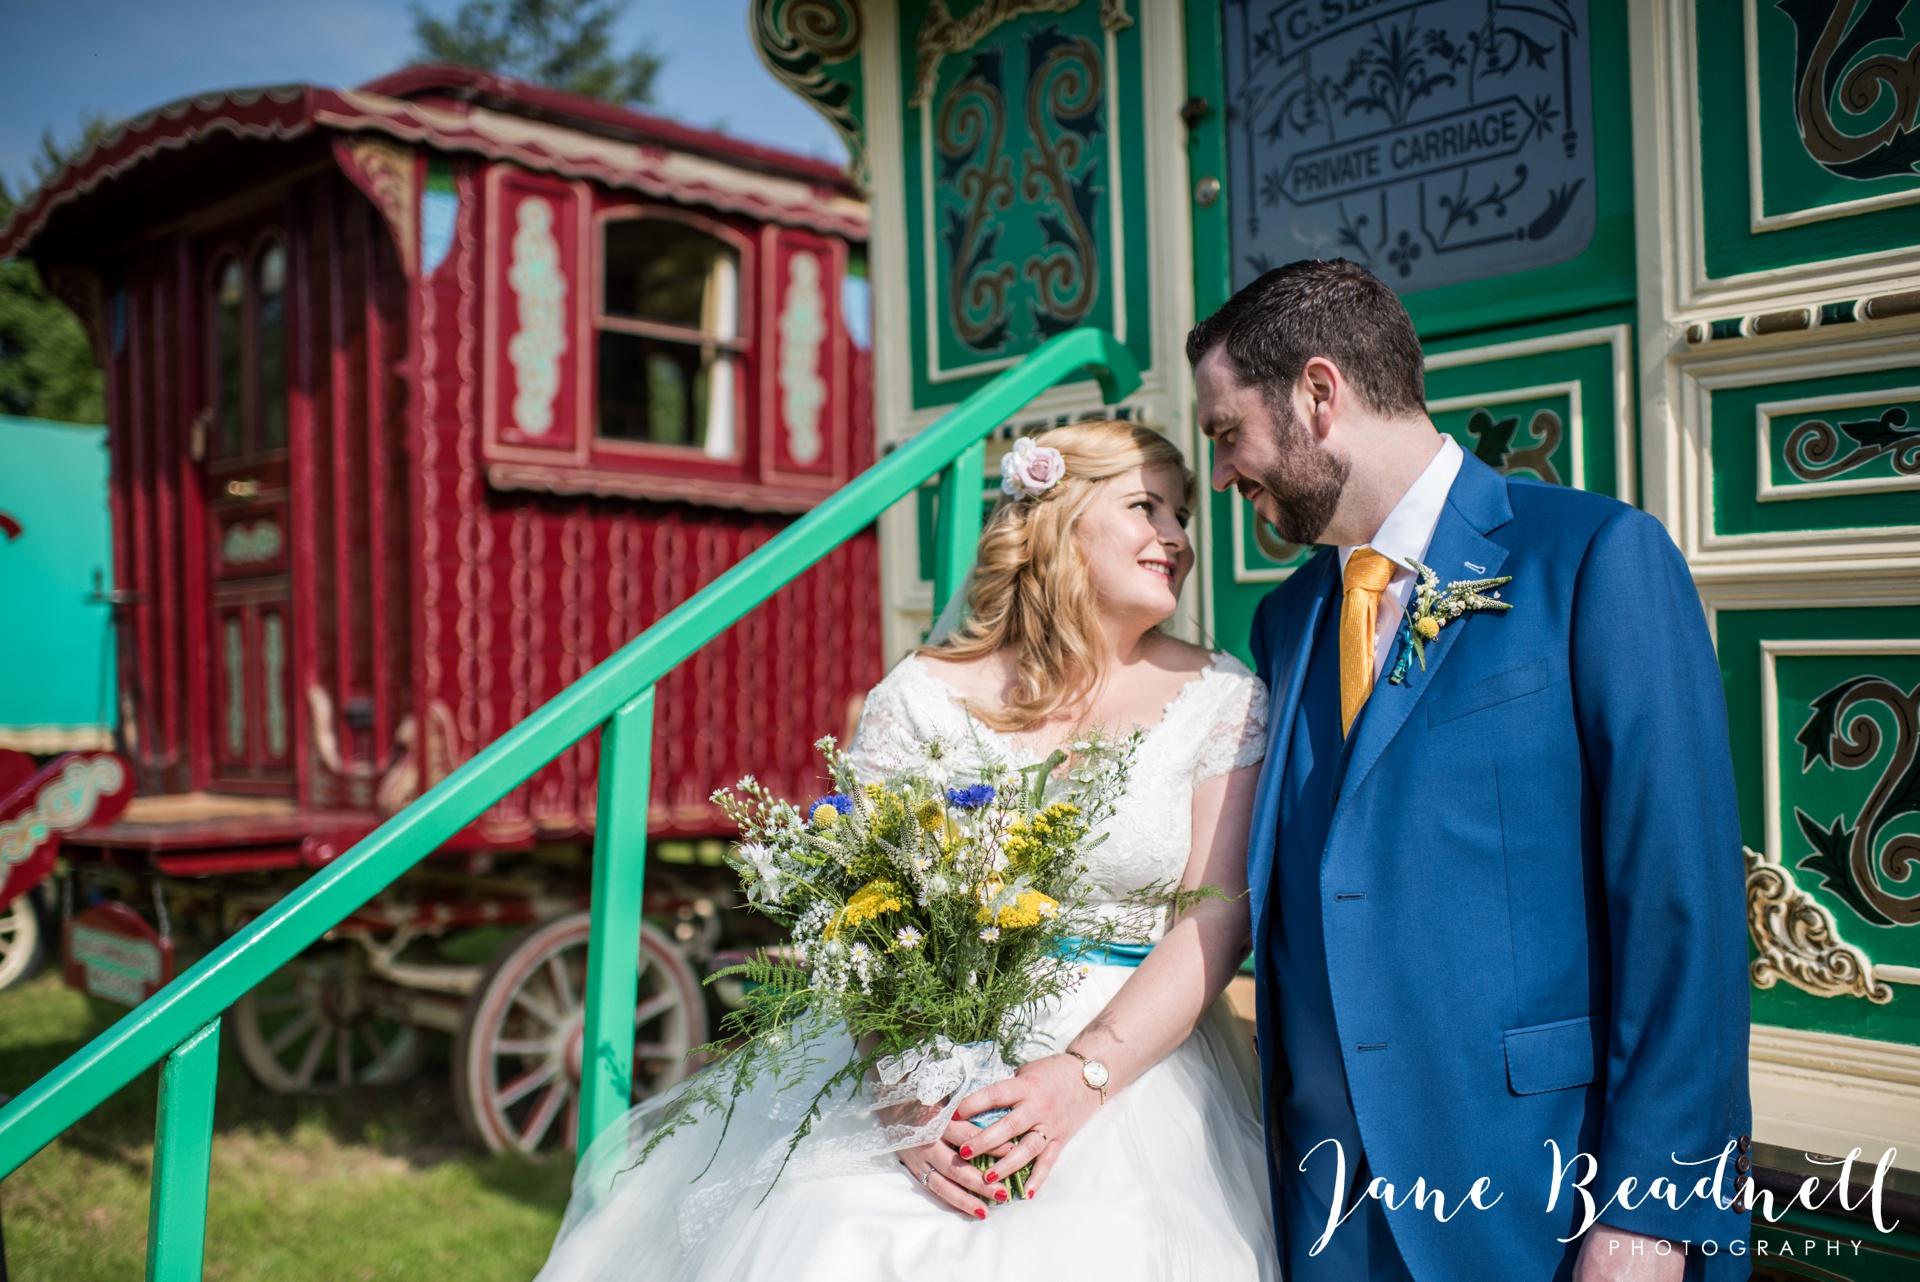 South Farm Wedding photography Hertfordshire by Jane Beadnell Photography fine art wedding photographer_0116